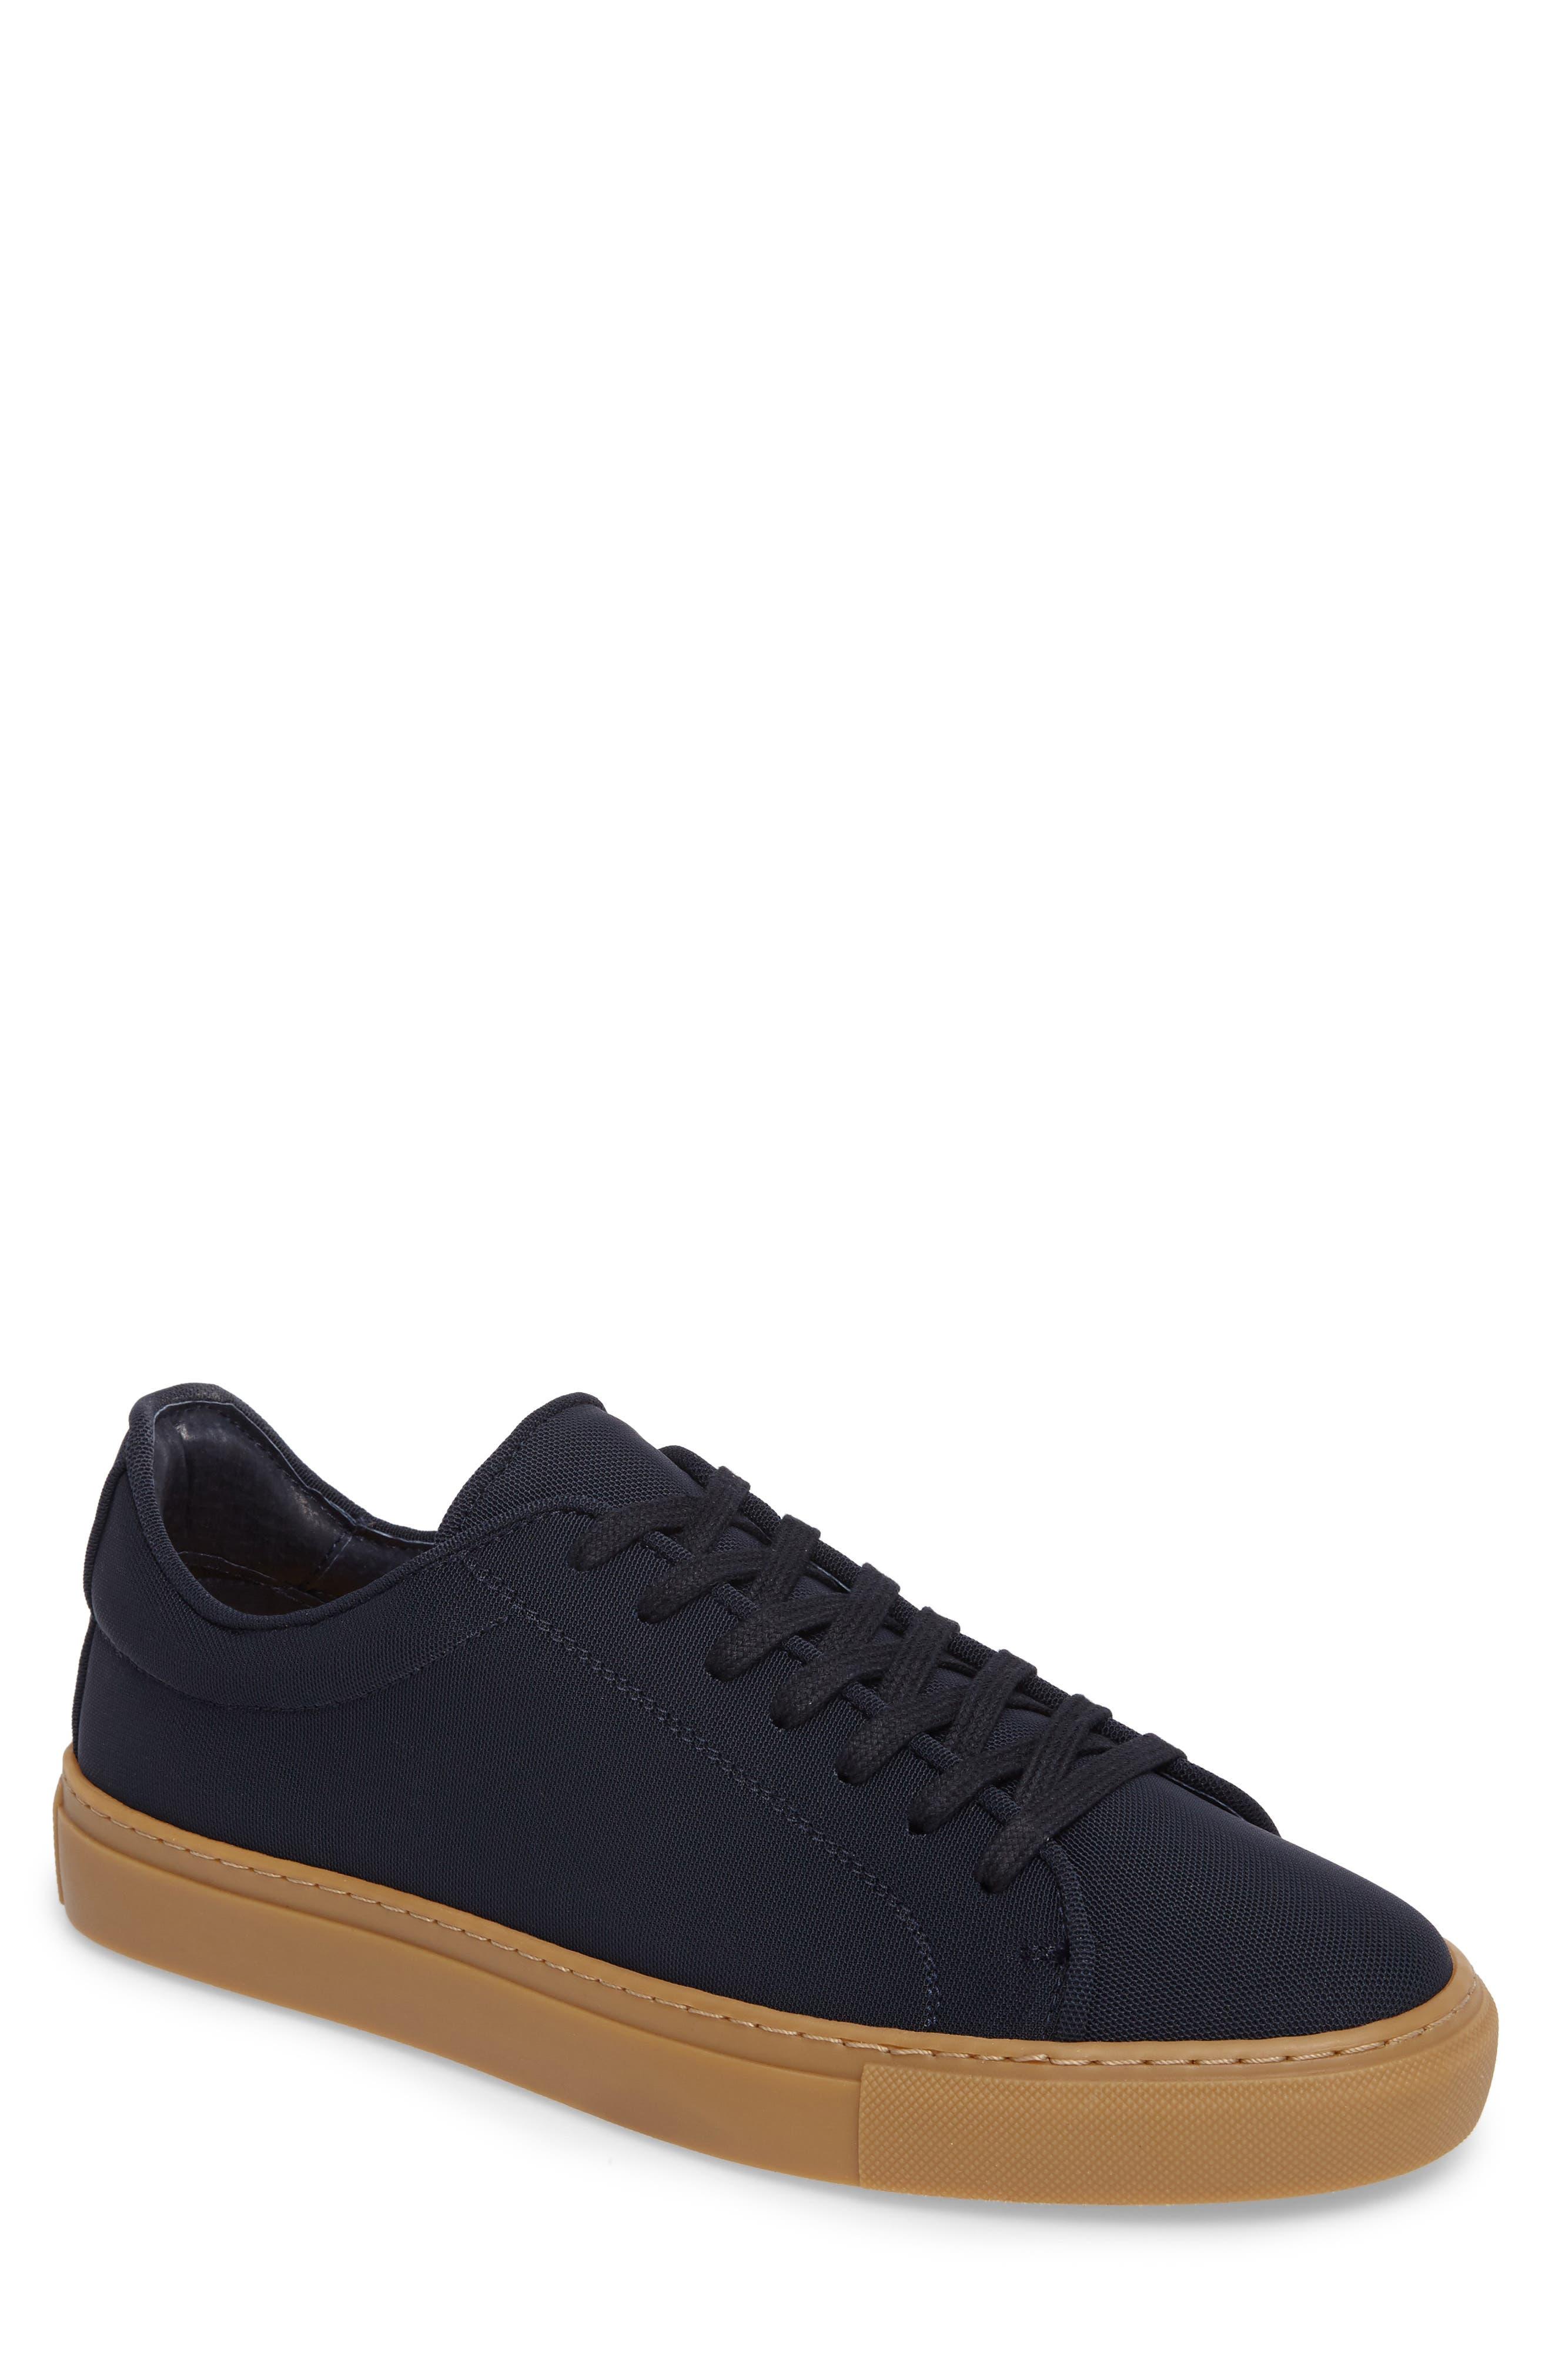 Dylan Sneaker,                         Main,                         color, Navy